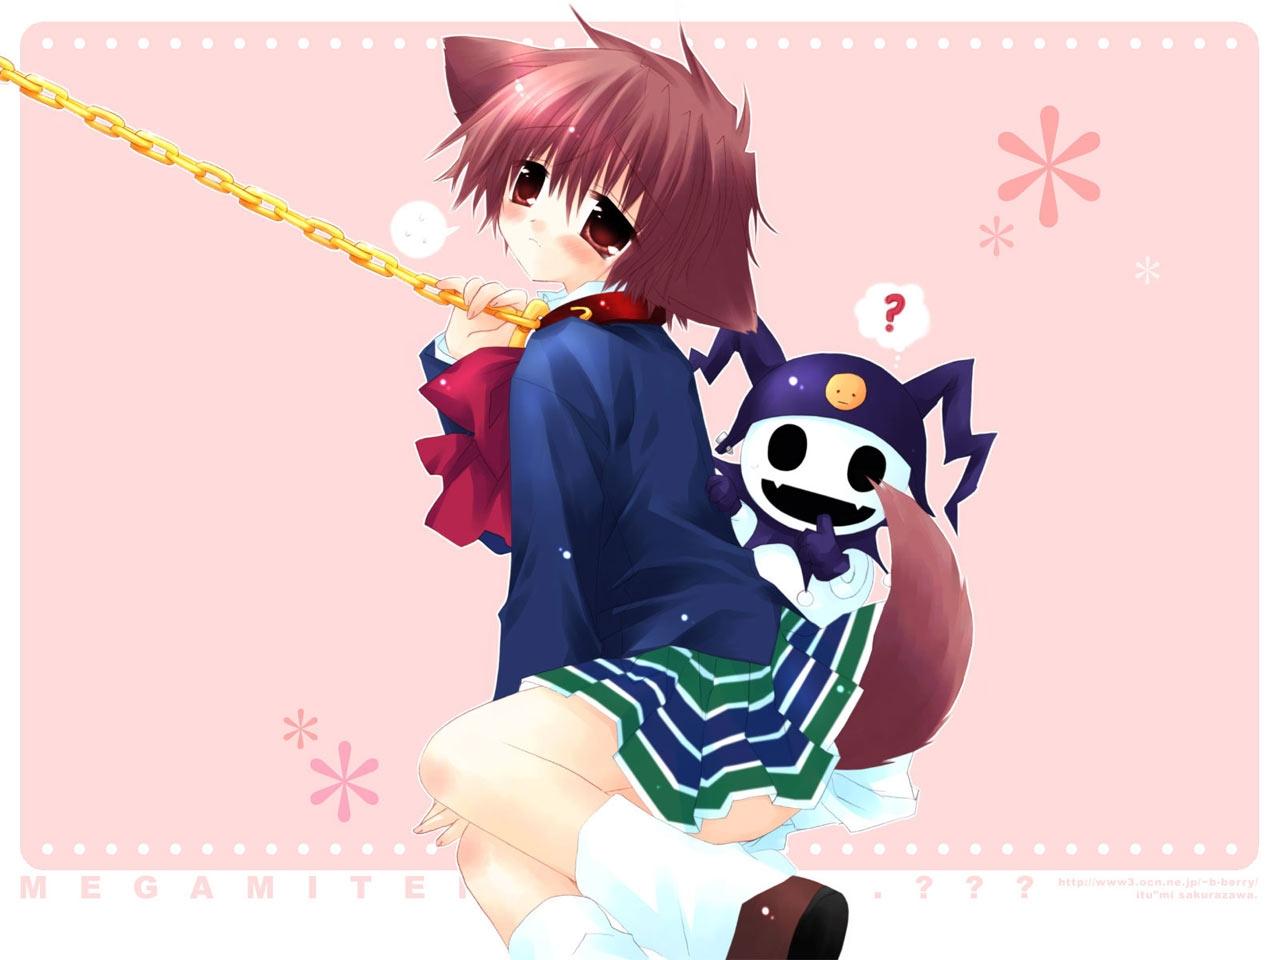 altus chain collar doggirl hinata_(pure_pure) jack_frost persona pure_pure sakurazawa_izumi shin_megami_tensei skirt